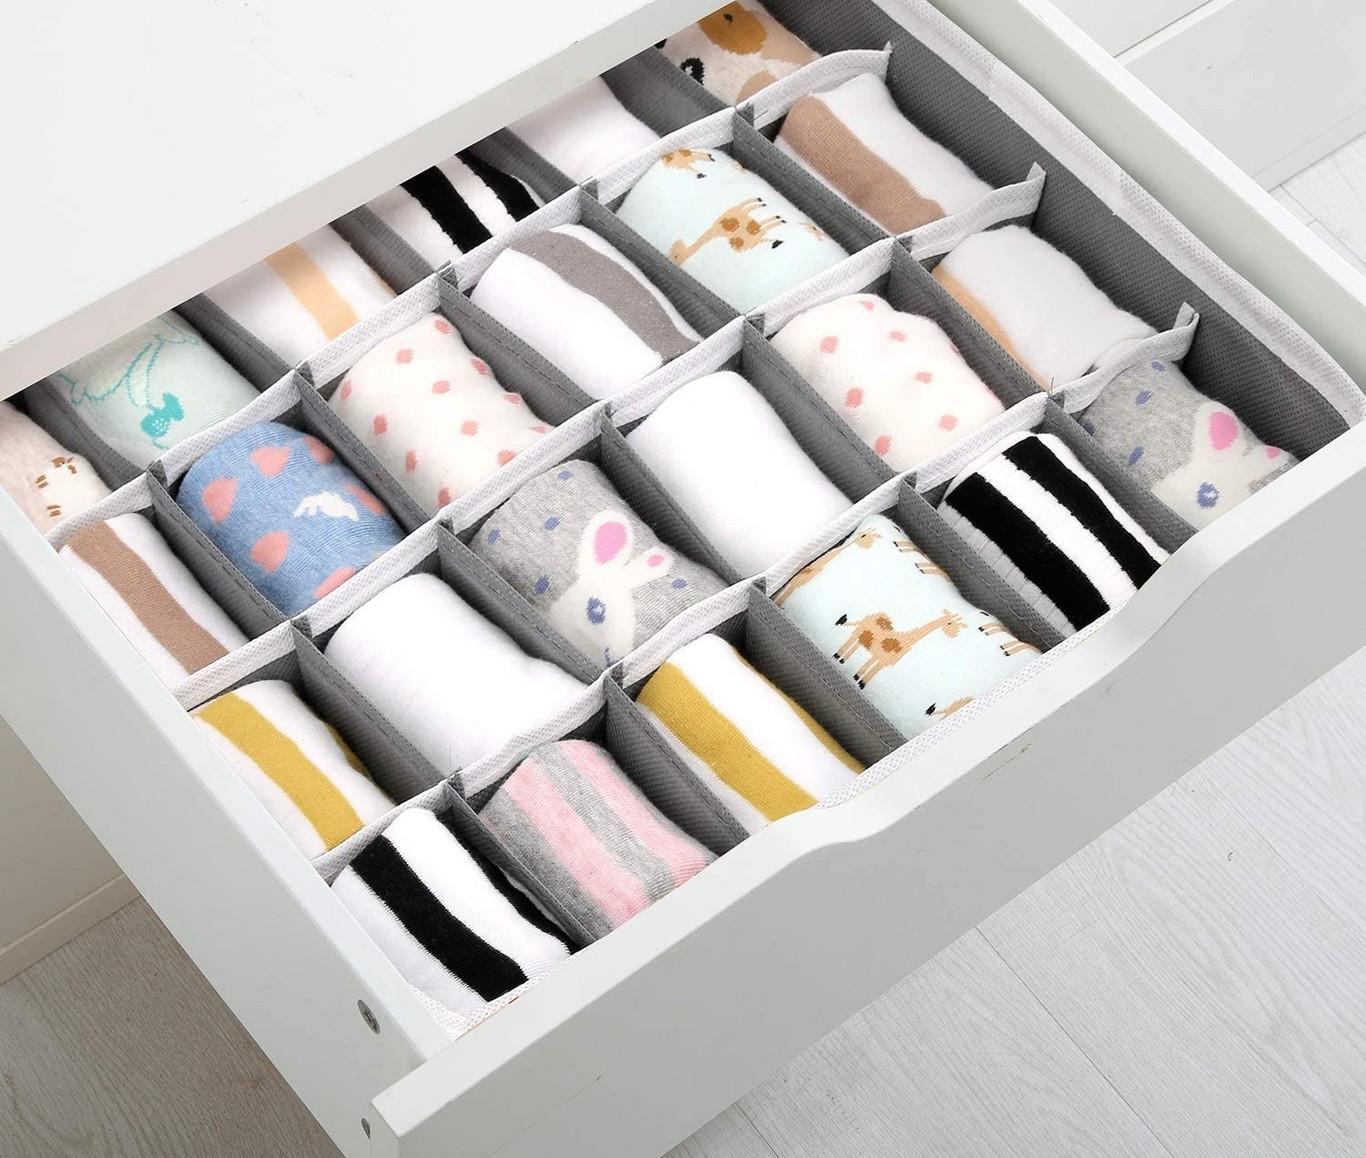 caja de ikea para ordenar braguitas